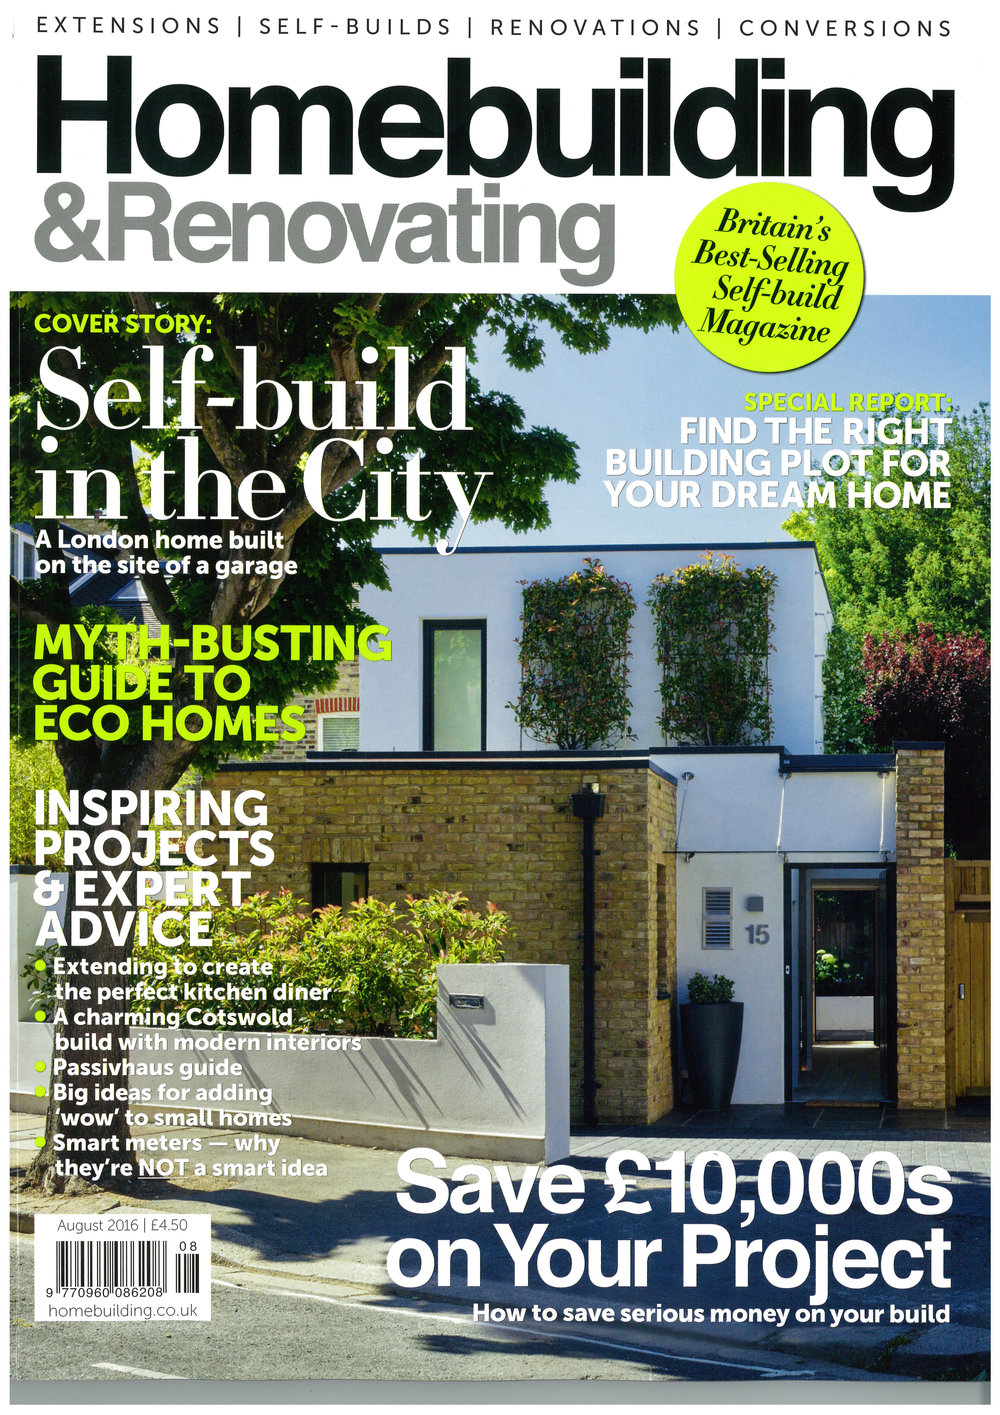 Homebuilding and Renovating Magazine, 2016